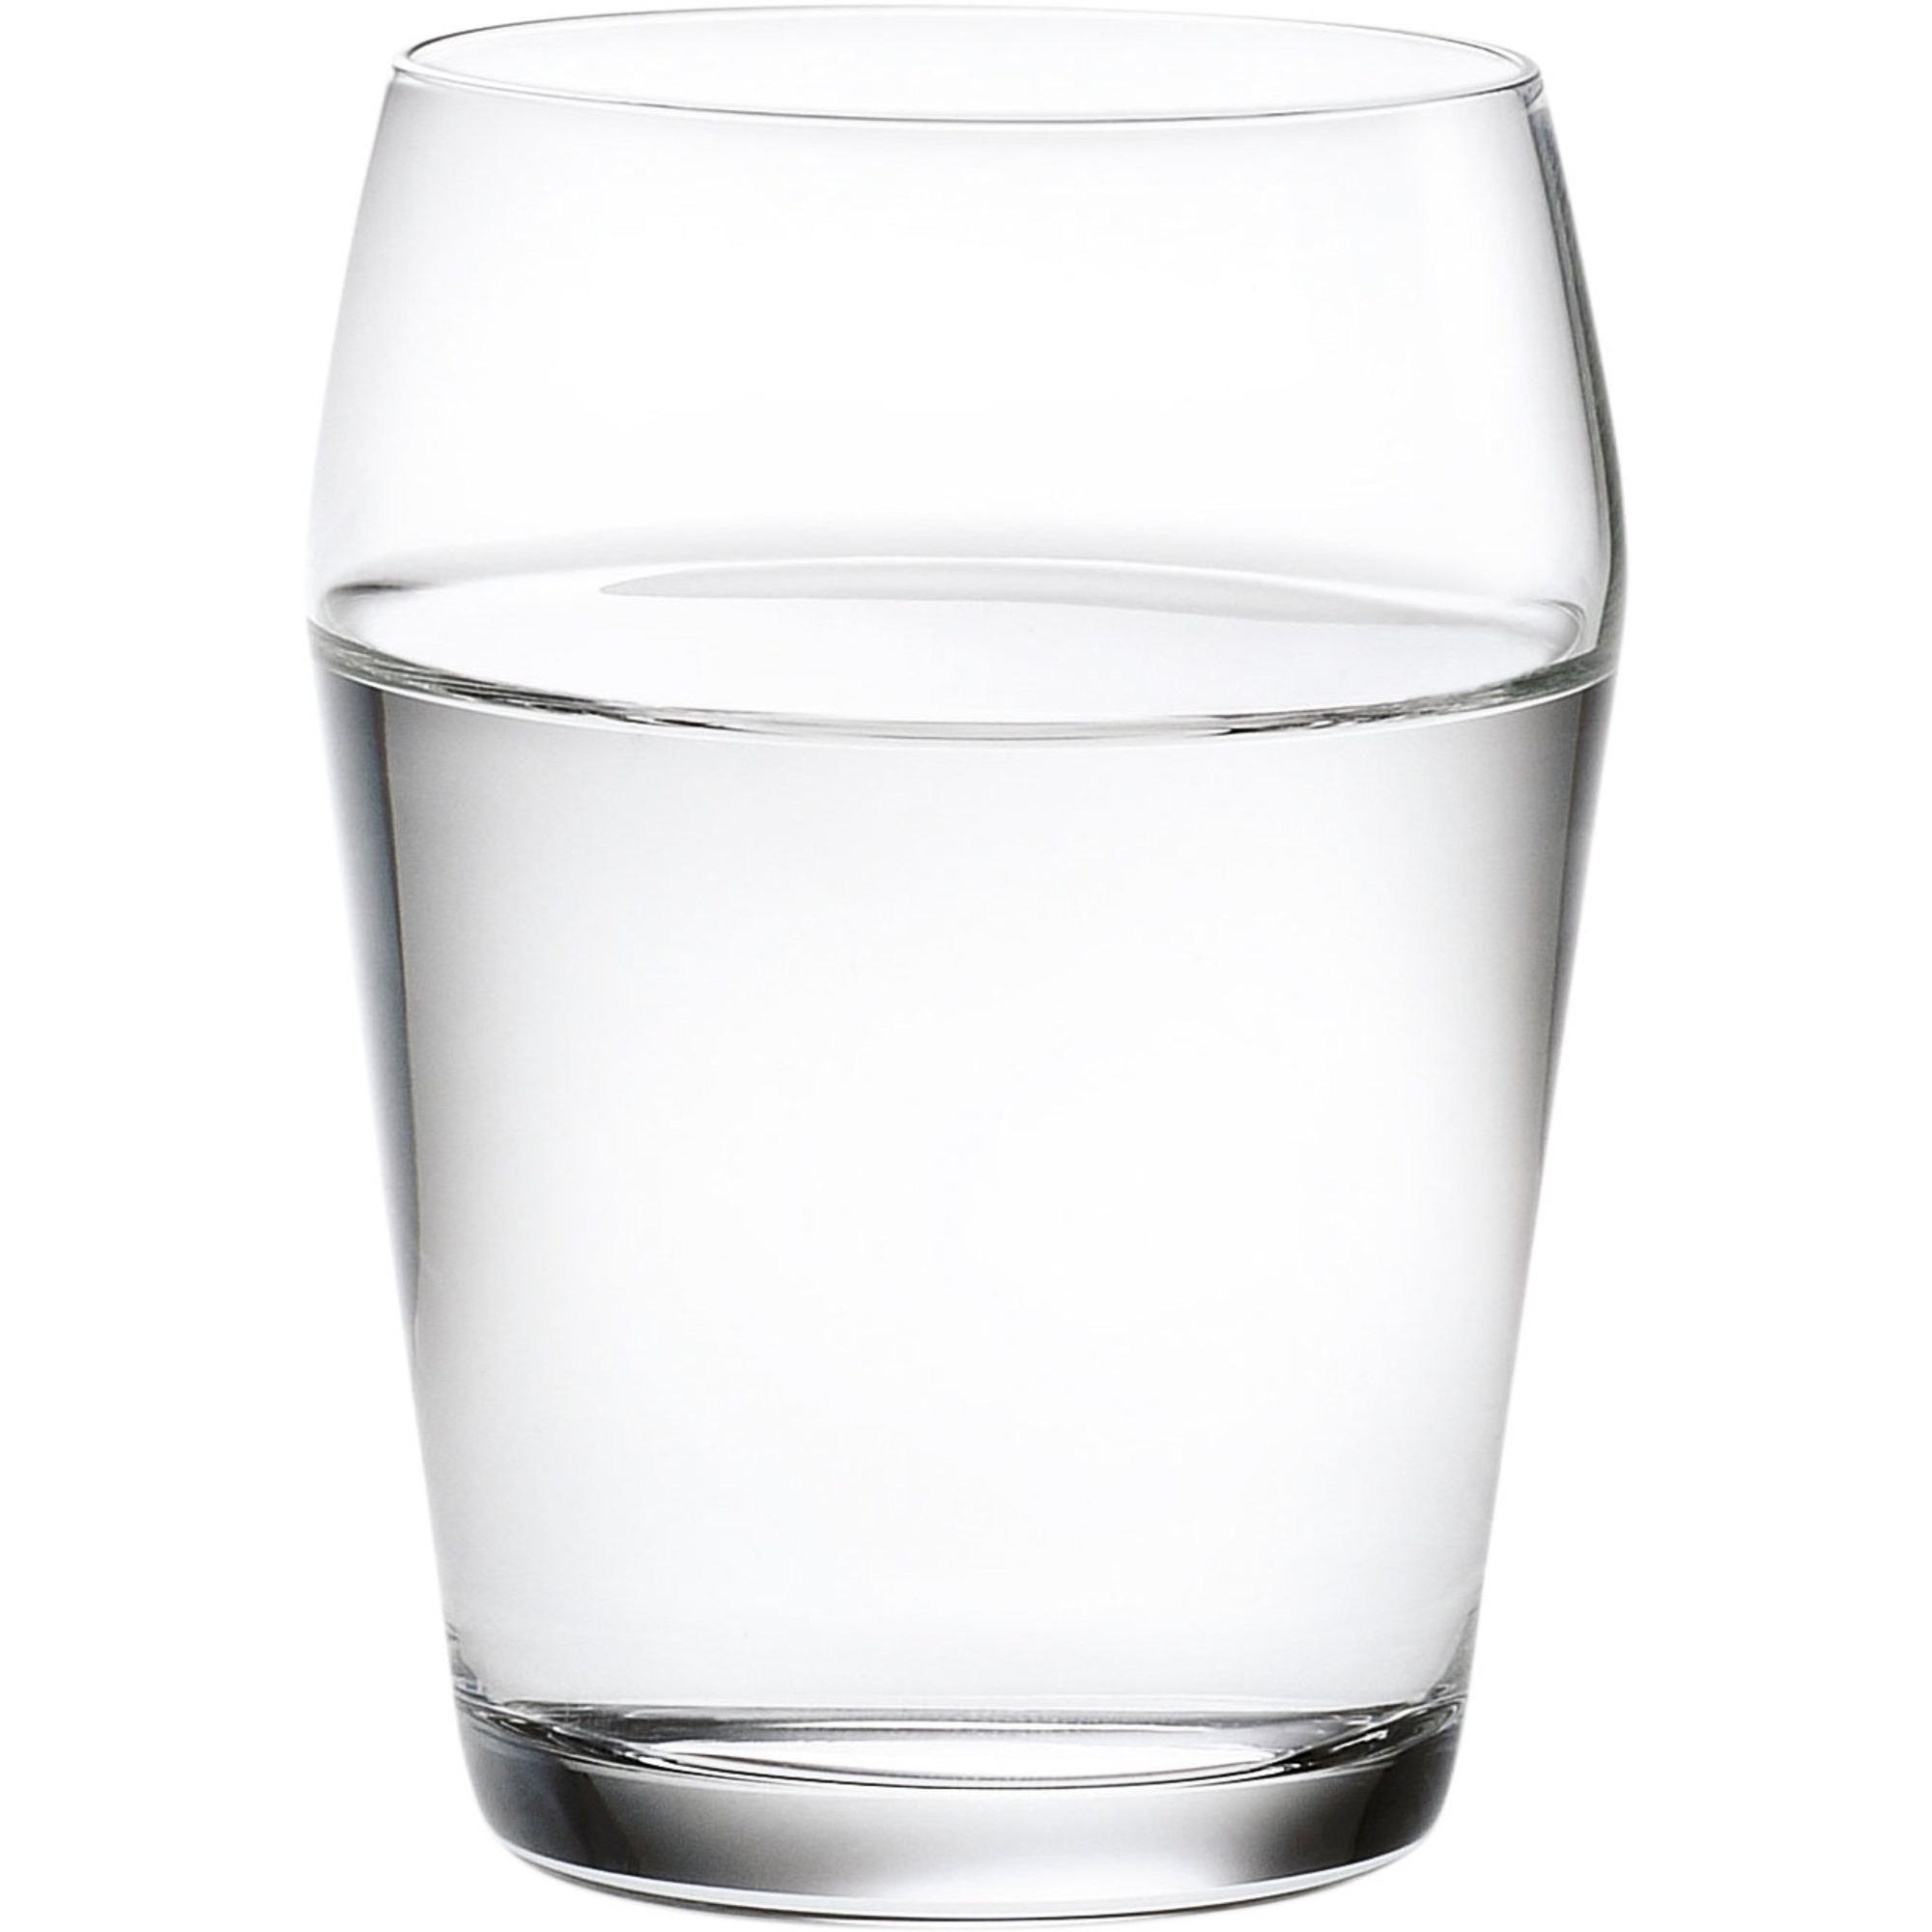 Holmegaard Perfection vattenglas 23 cl